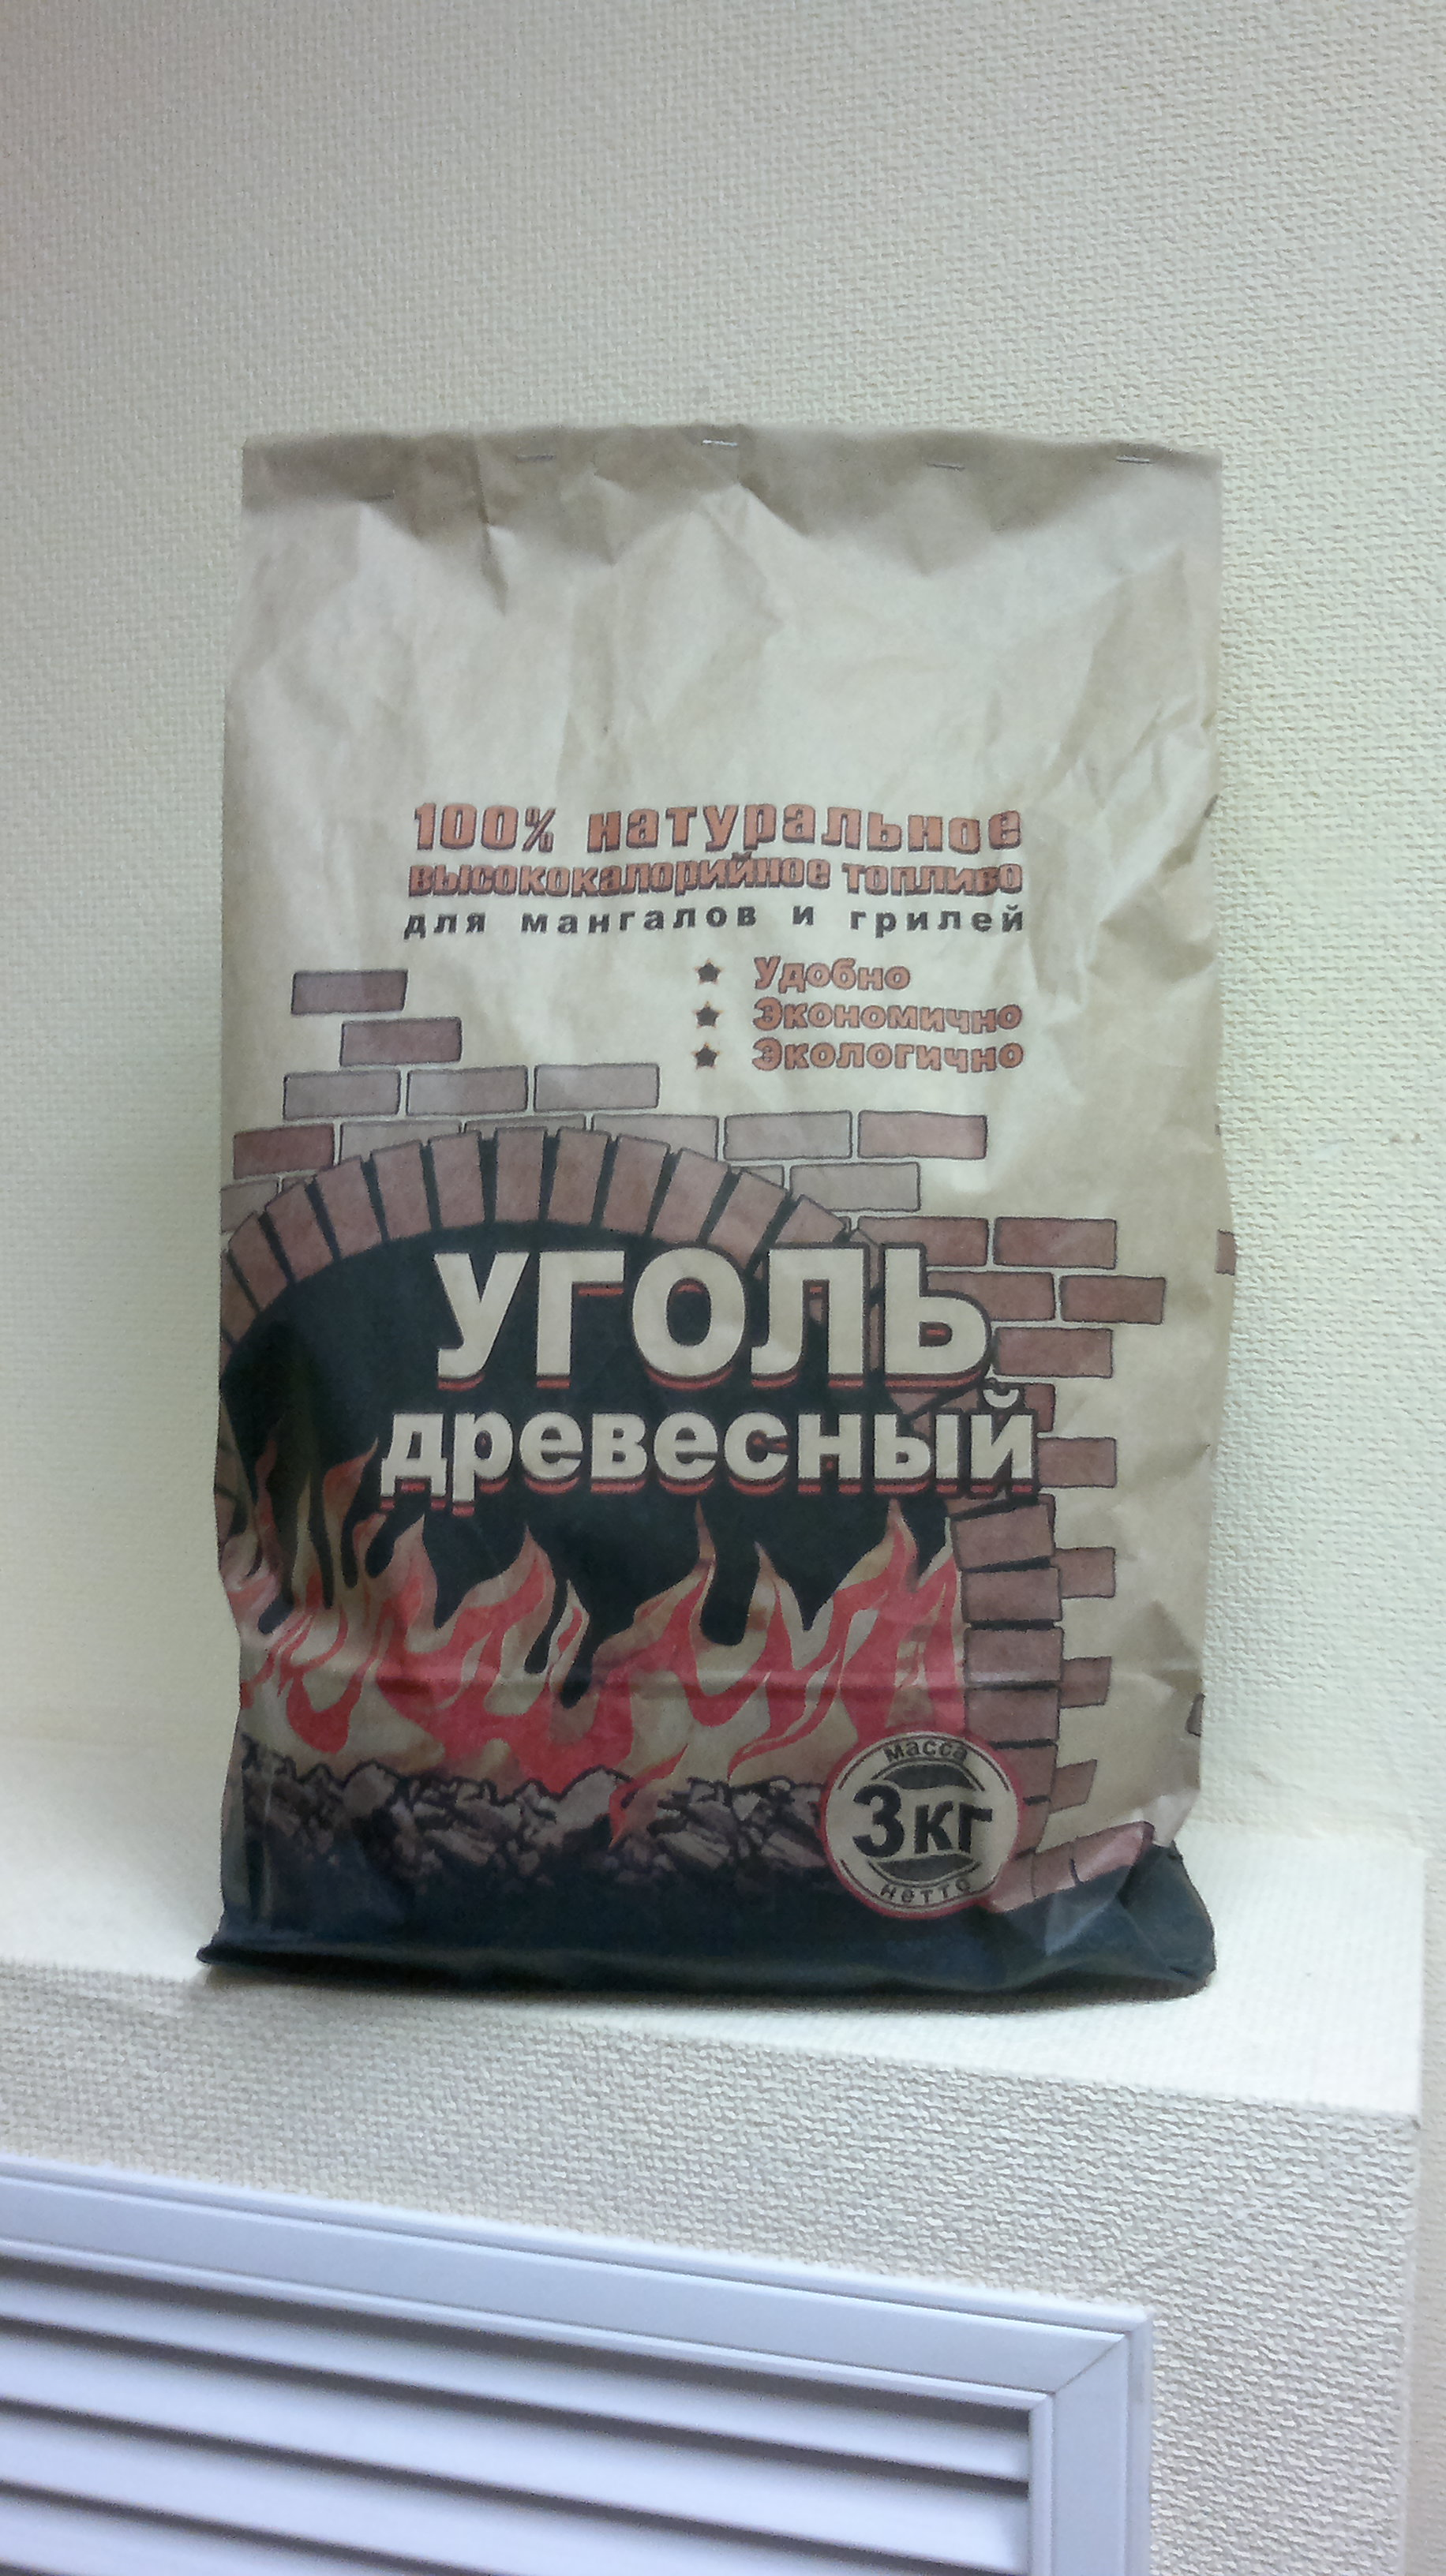 http://s2.uploads.ru/9QegX.jpg